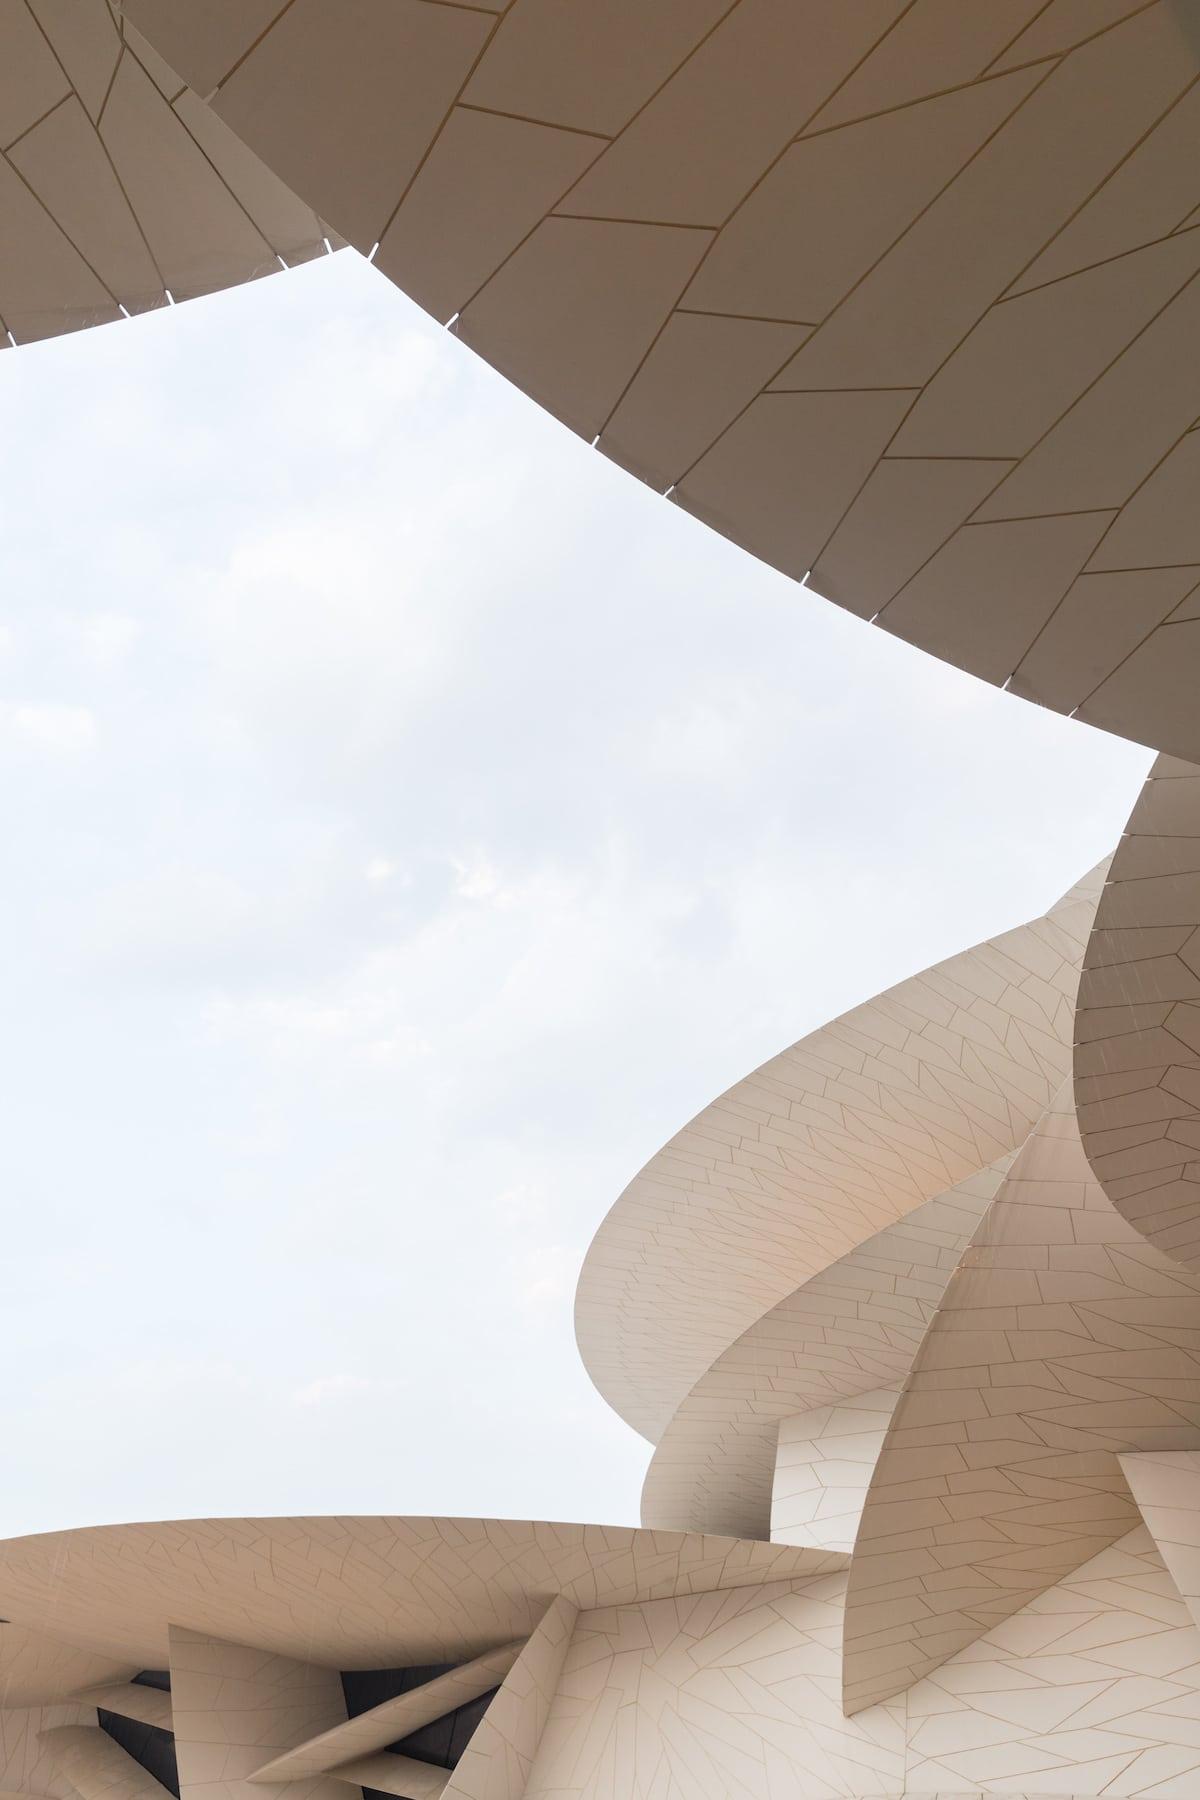 Ateliers-Jean-Nouvel-Doha-Nationa-Museum-Qatar-©Iwan-Baan-11